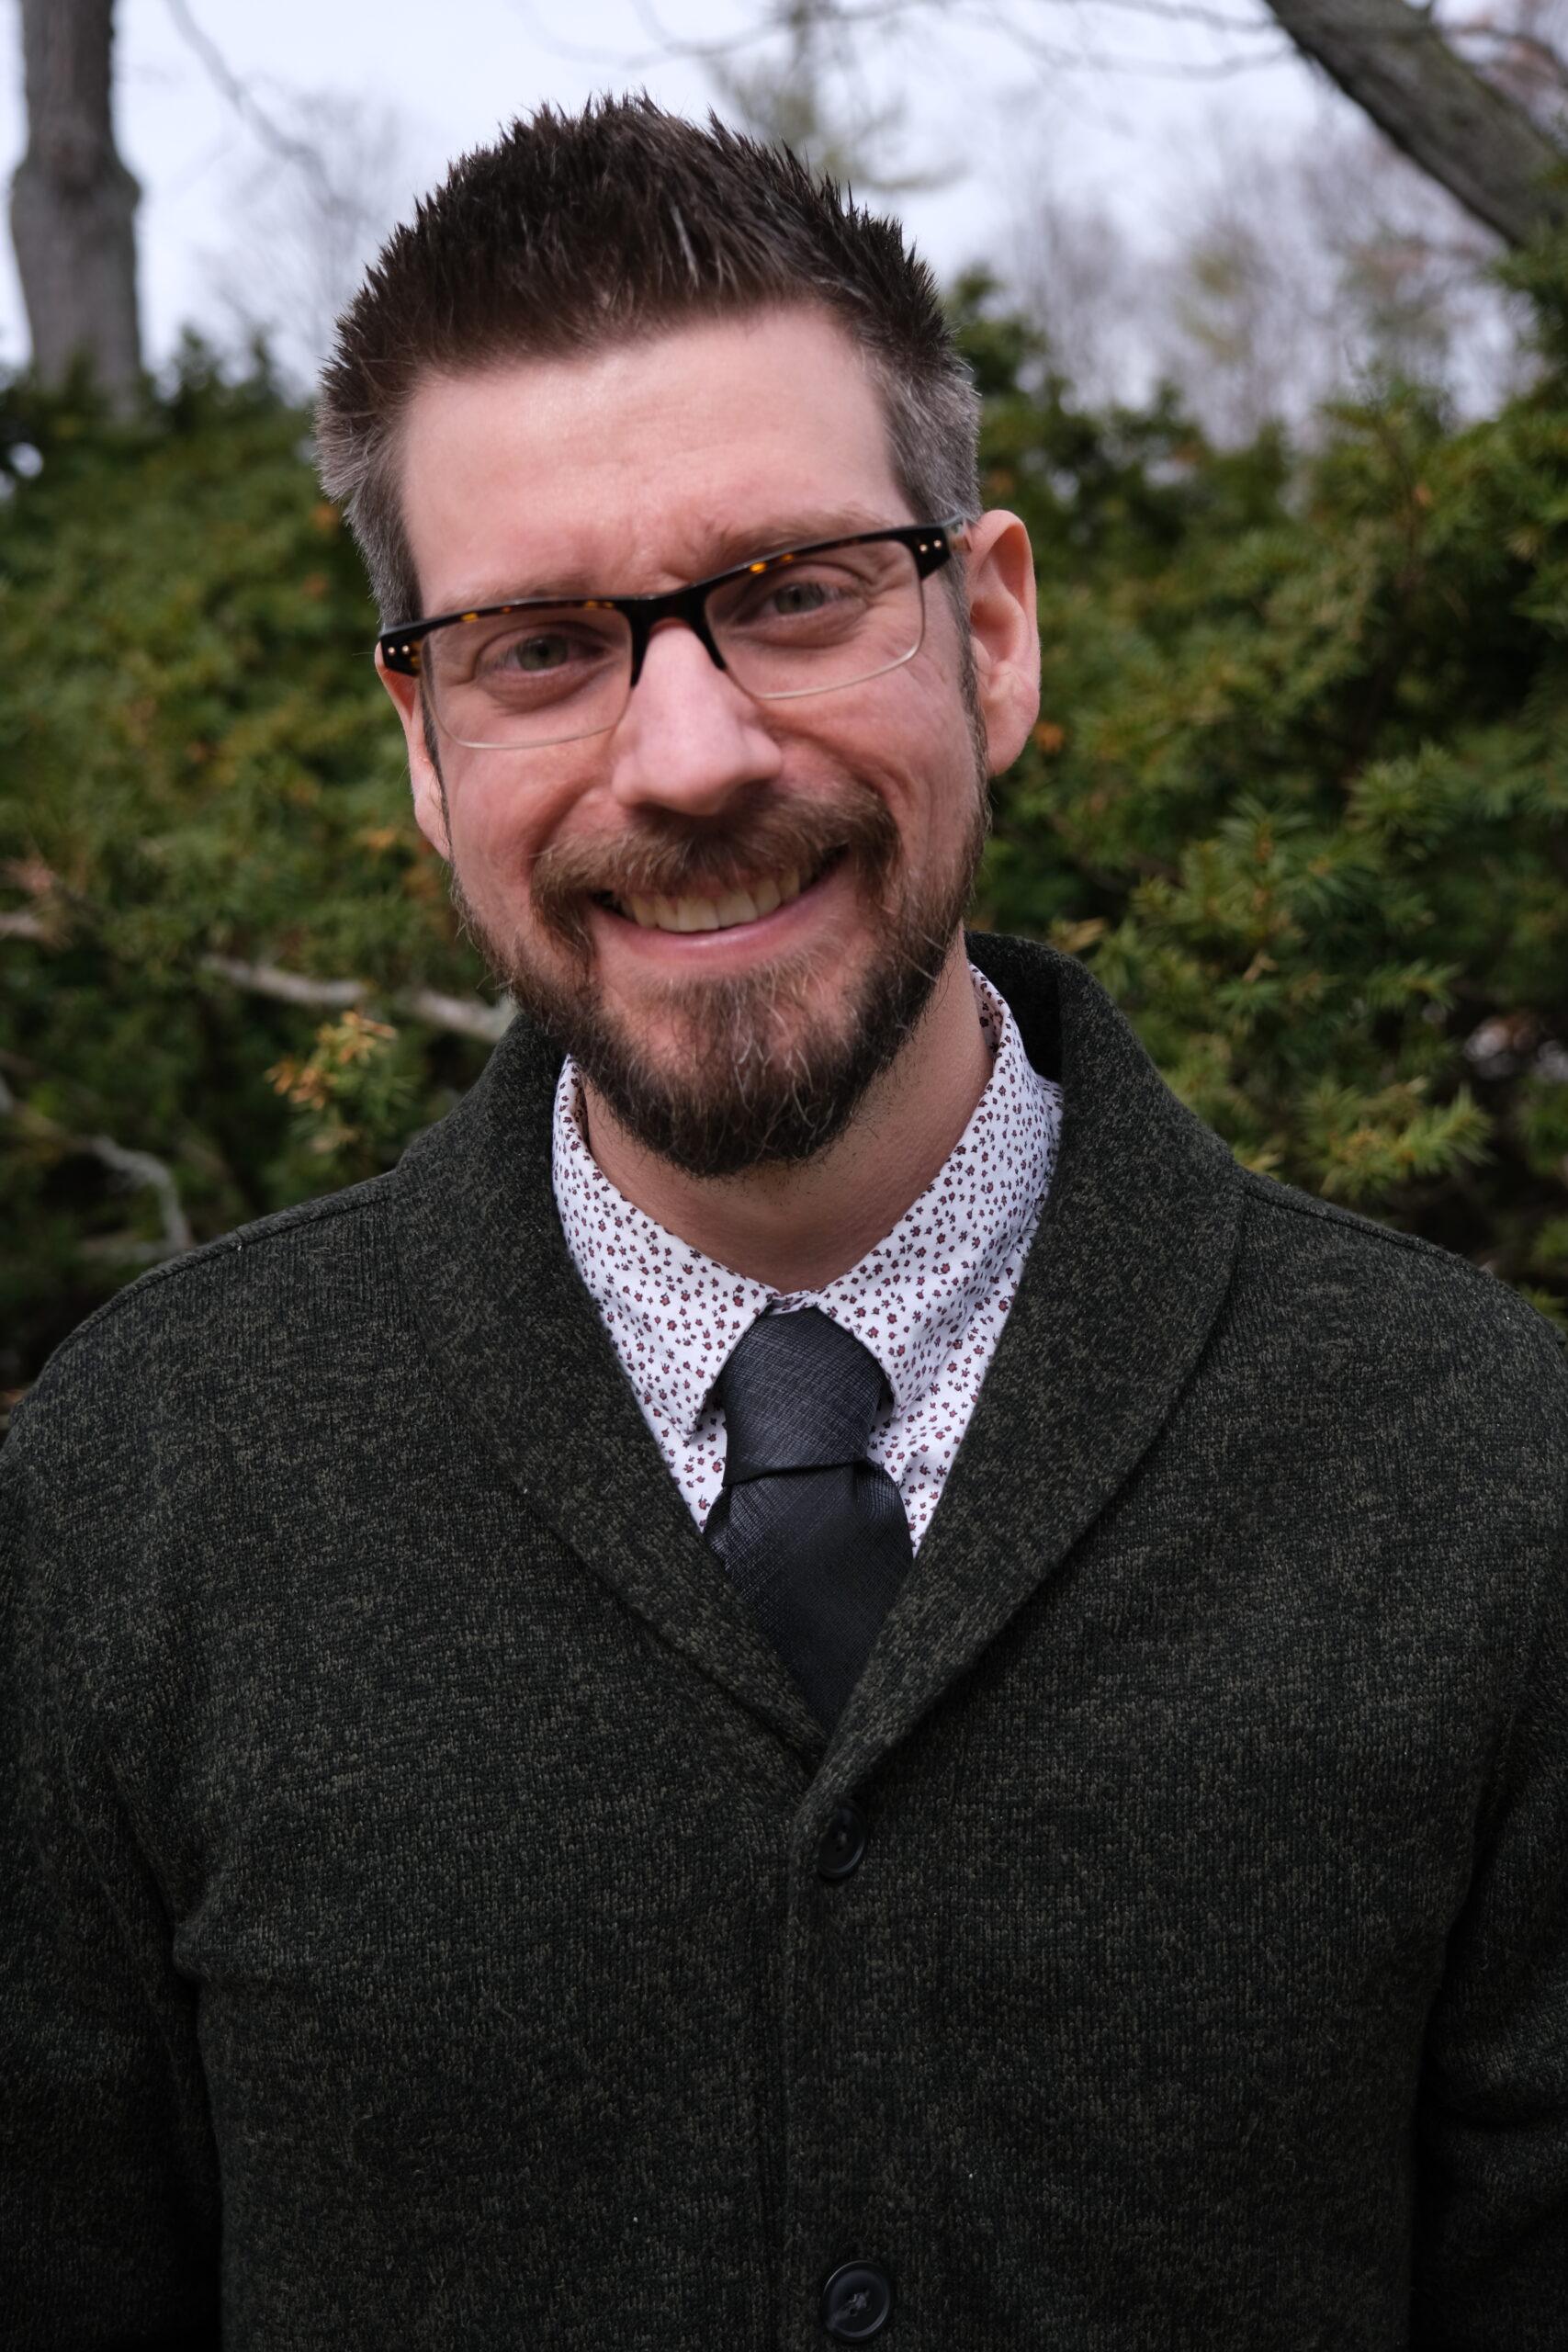 Profile image of Wade Syers